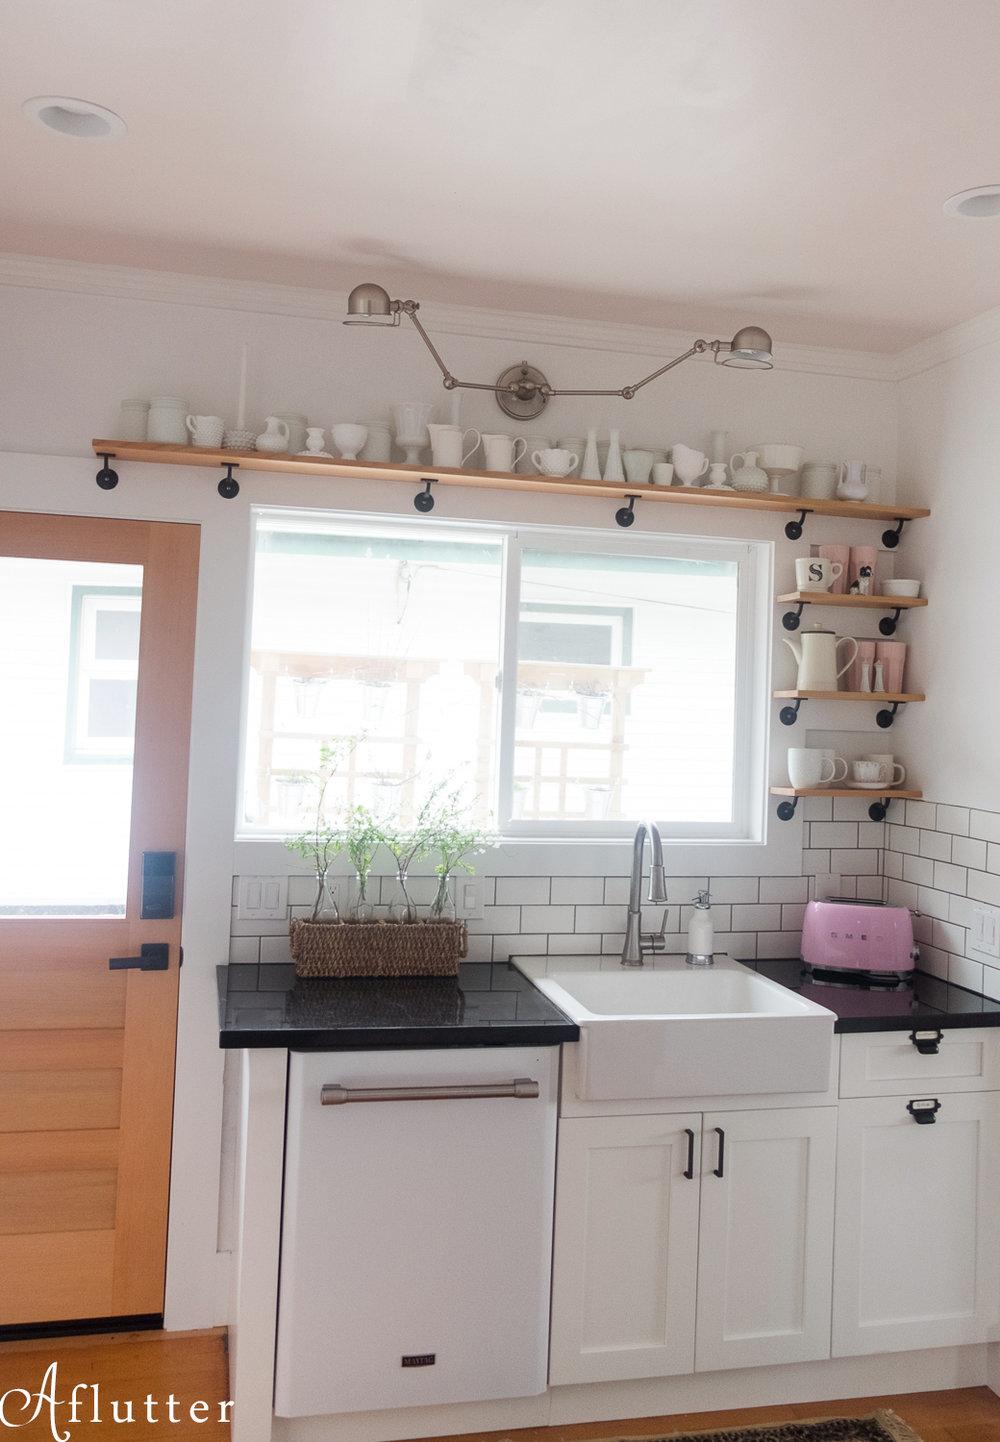 Kitchen-After-Photos-Spring-5-of-17-watermark.jpg